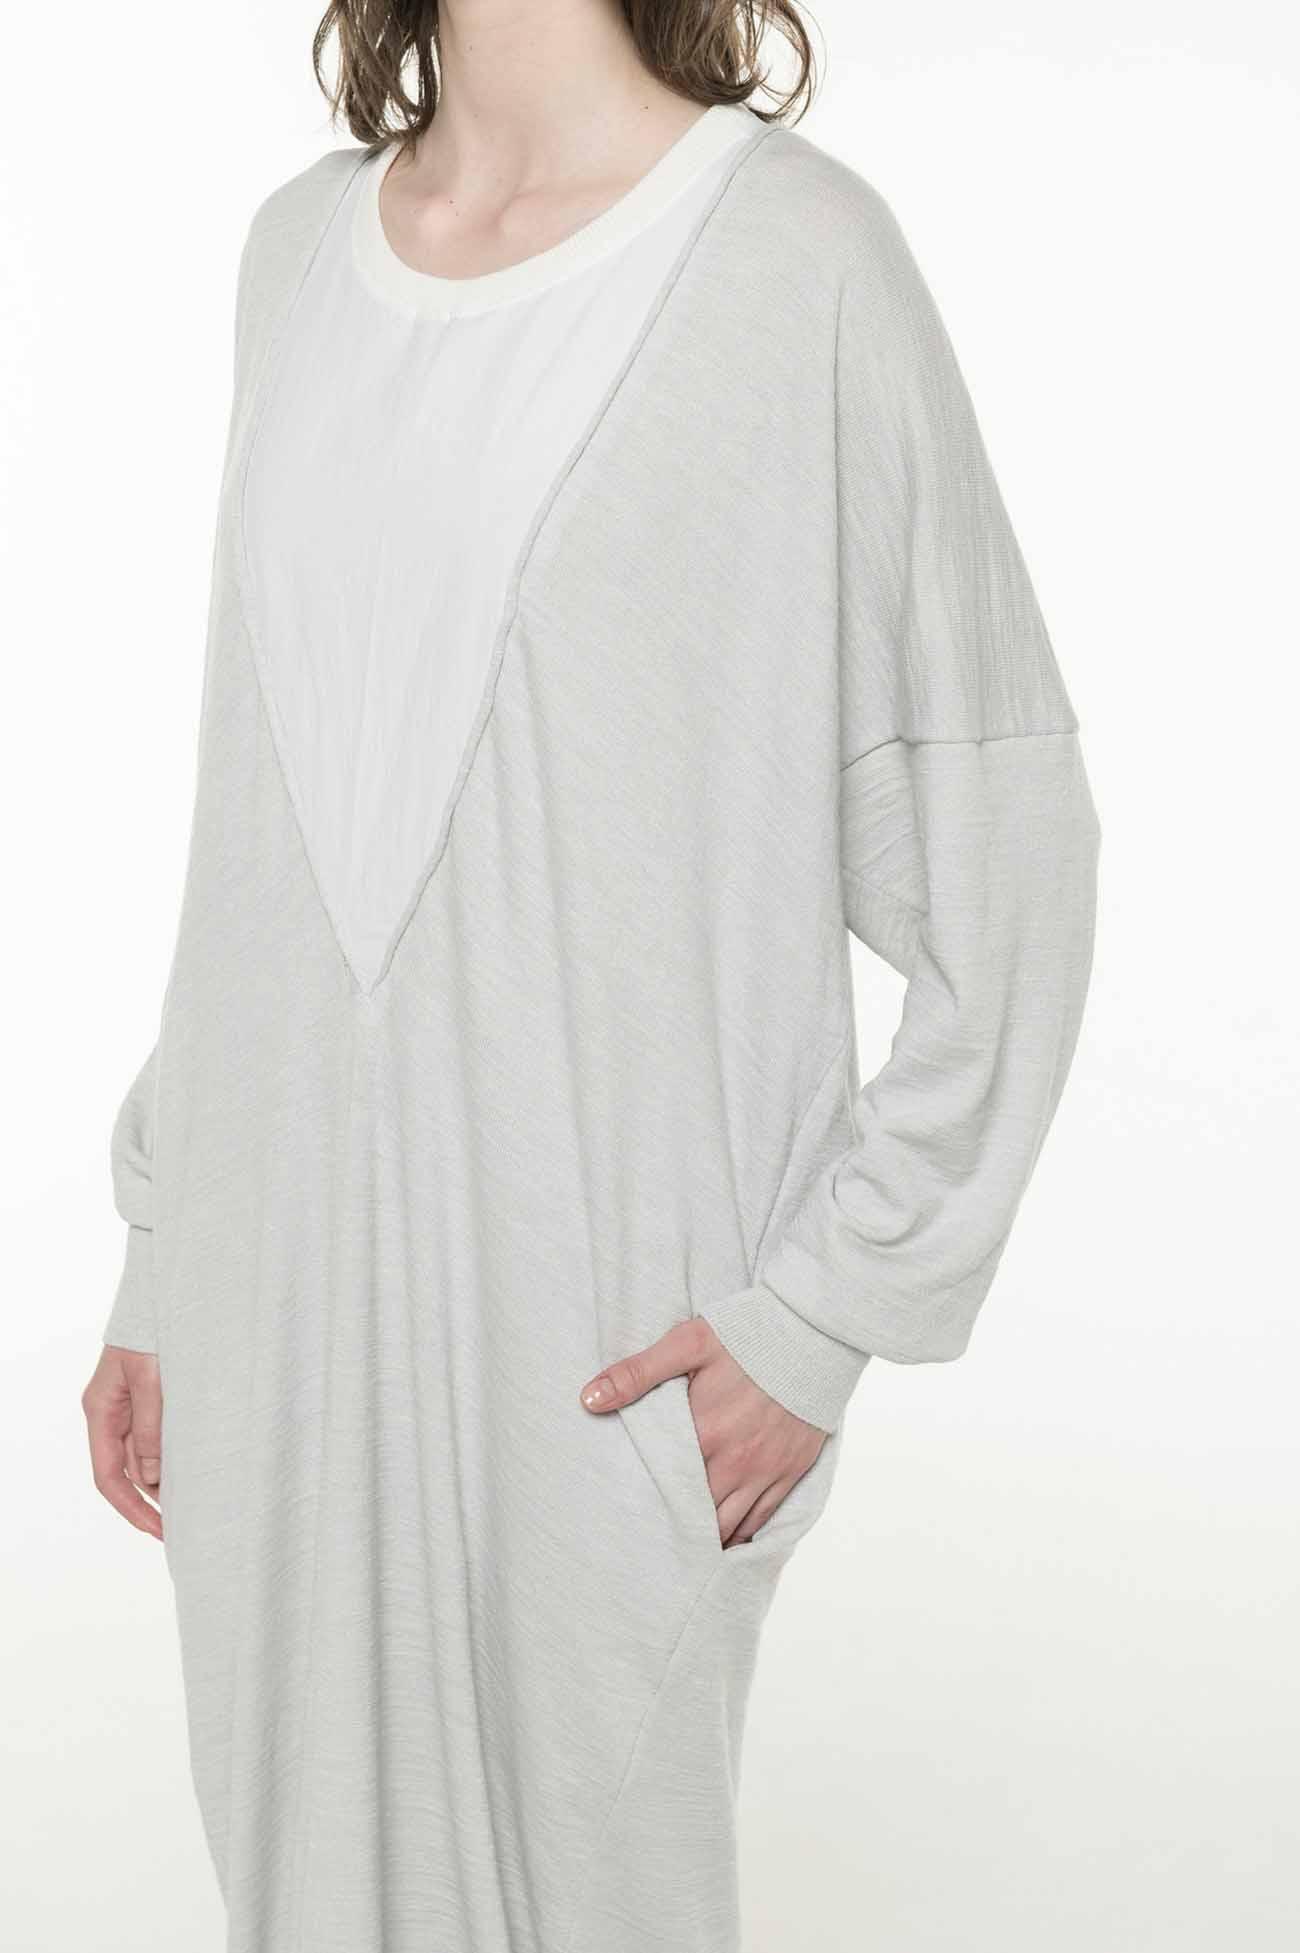 2/34Ry/Ny/Li12G1P PLAIN STITCH LAYER STYLE LONG SLEEVE DRESS